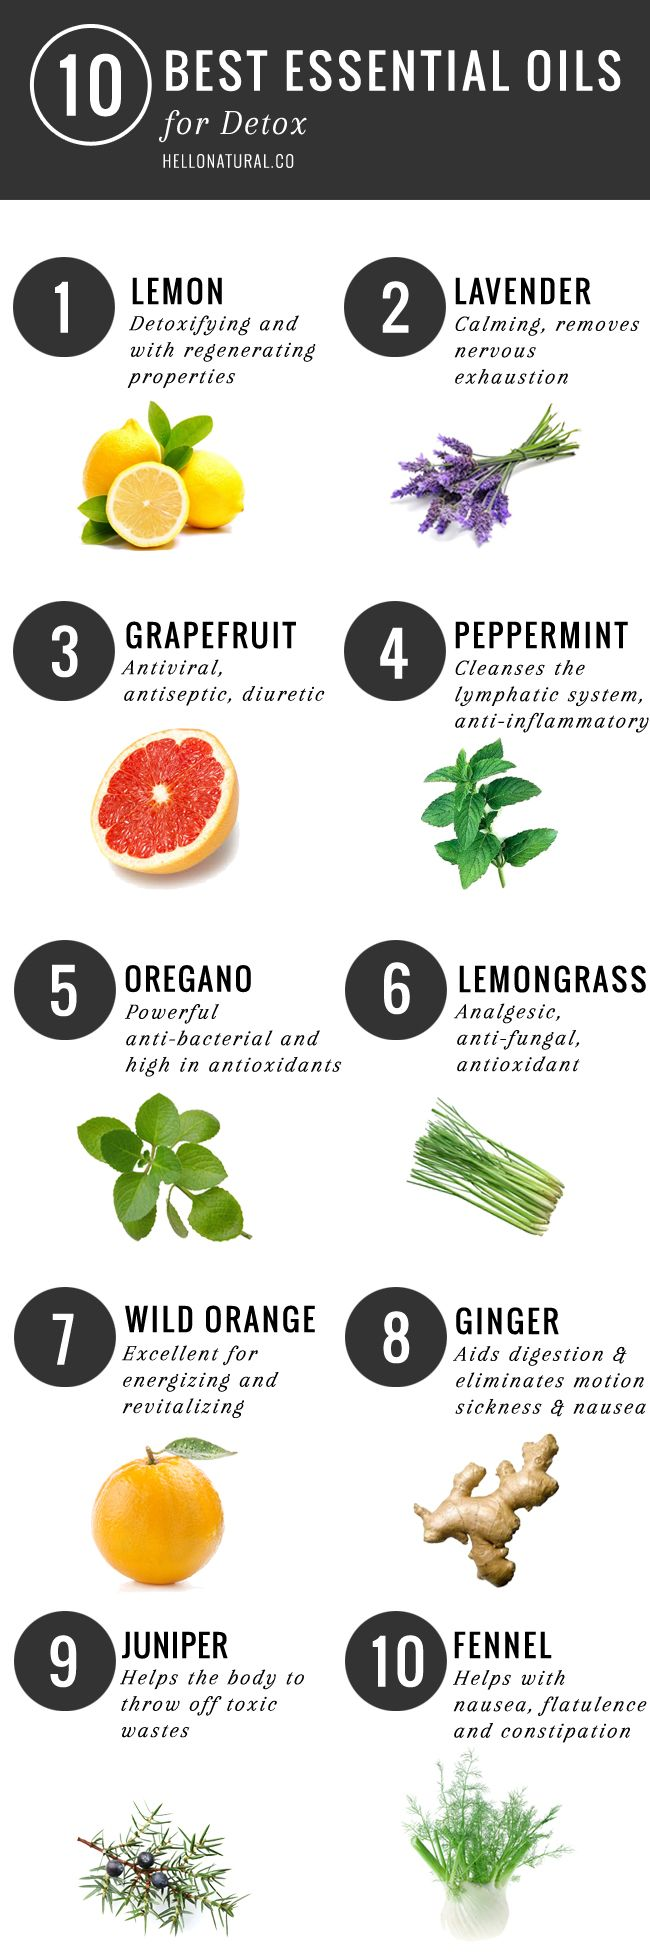 Top 10 Essential Oils For Detox Essential Oils Best